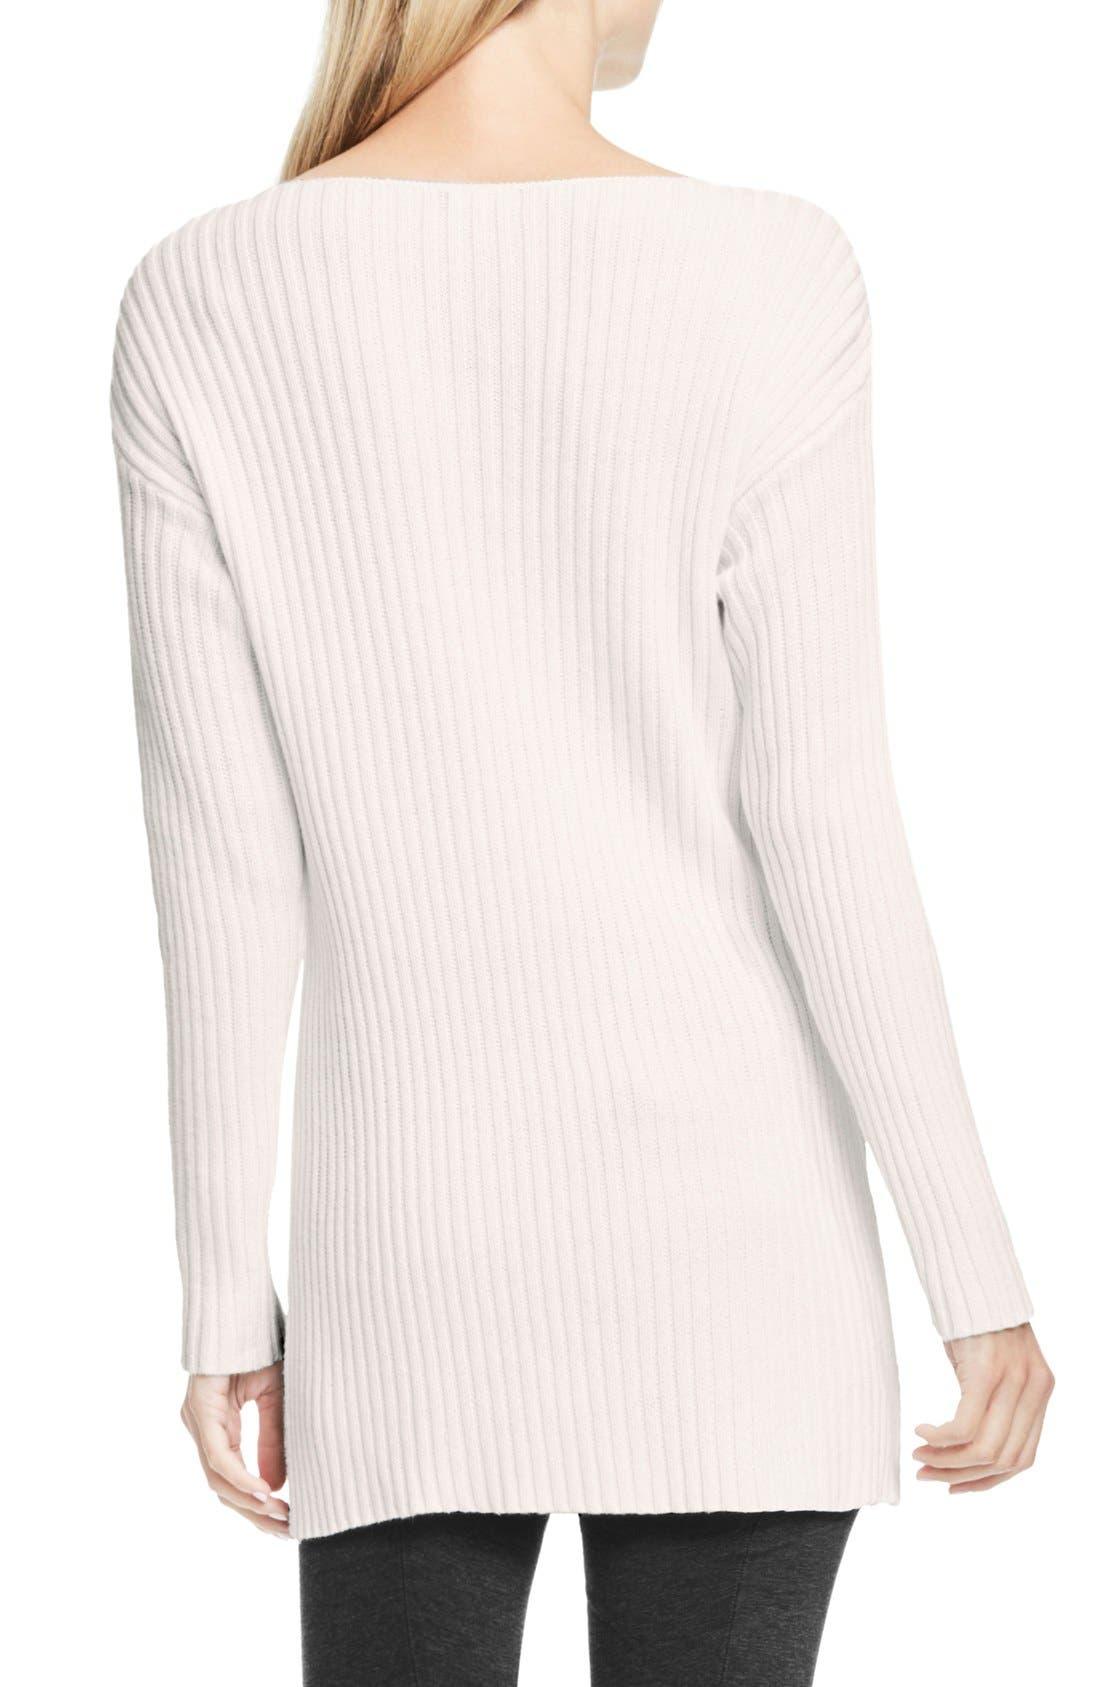 Alternate Image 3  - Vince Camuto Rib Knit Long Sweater (Petite)